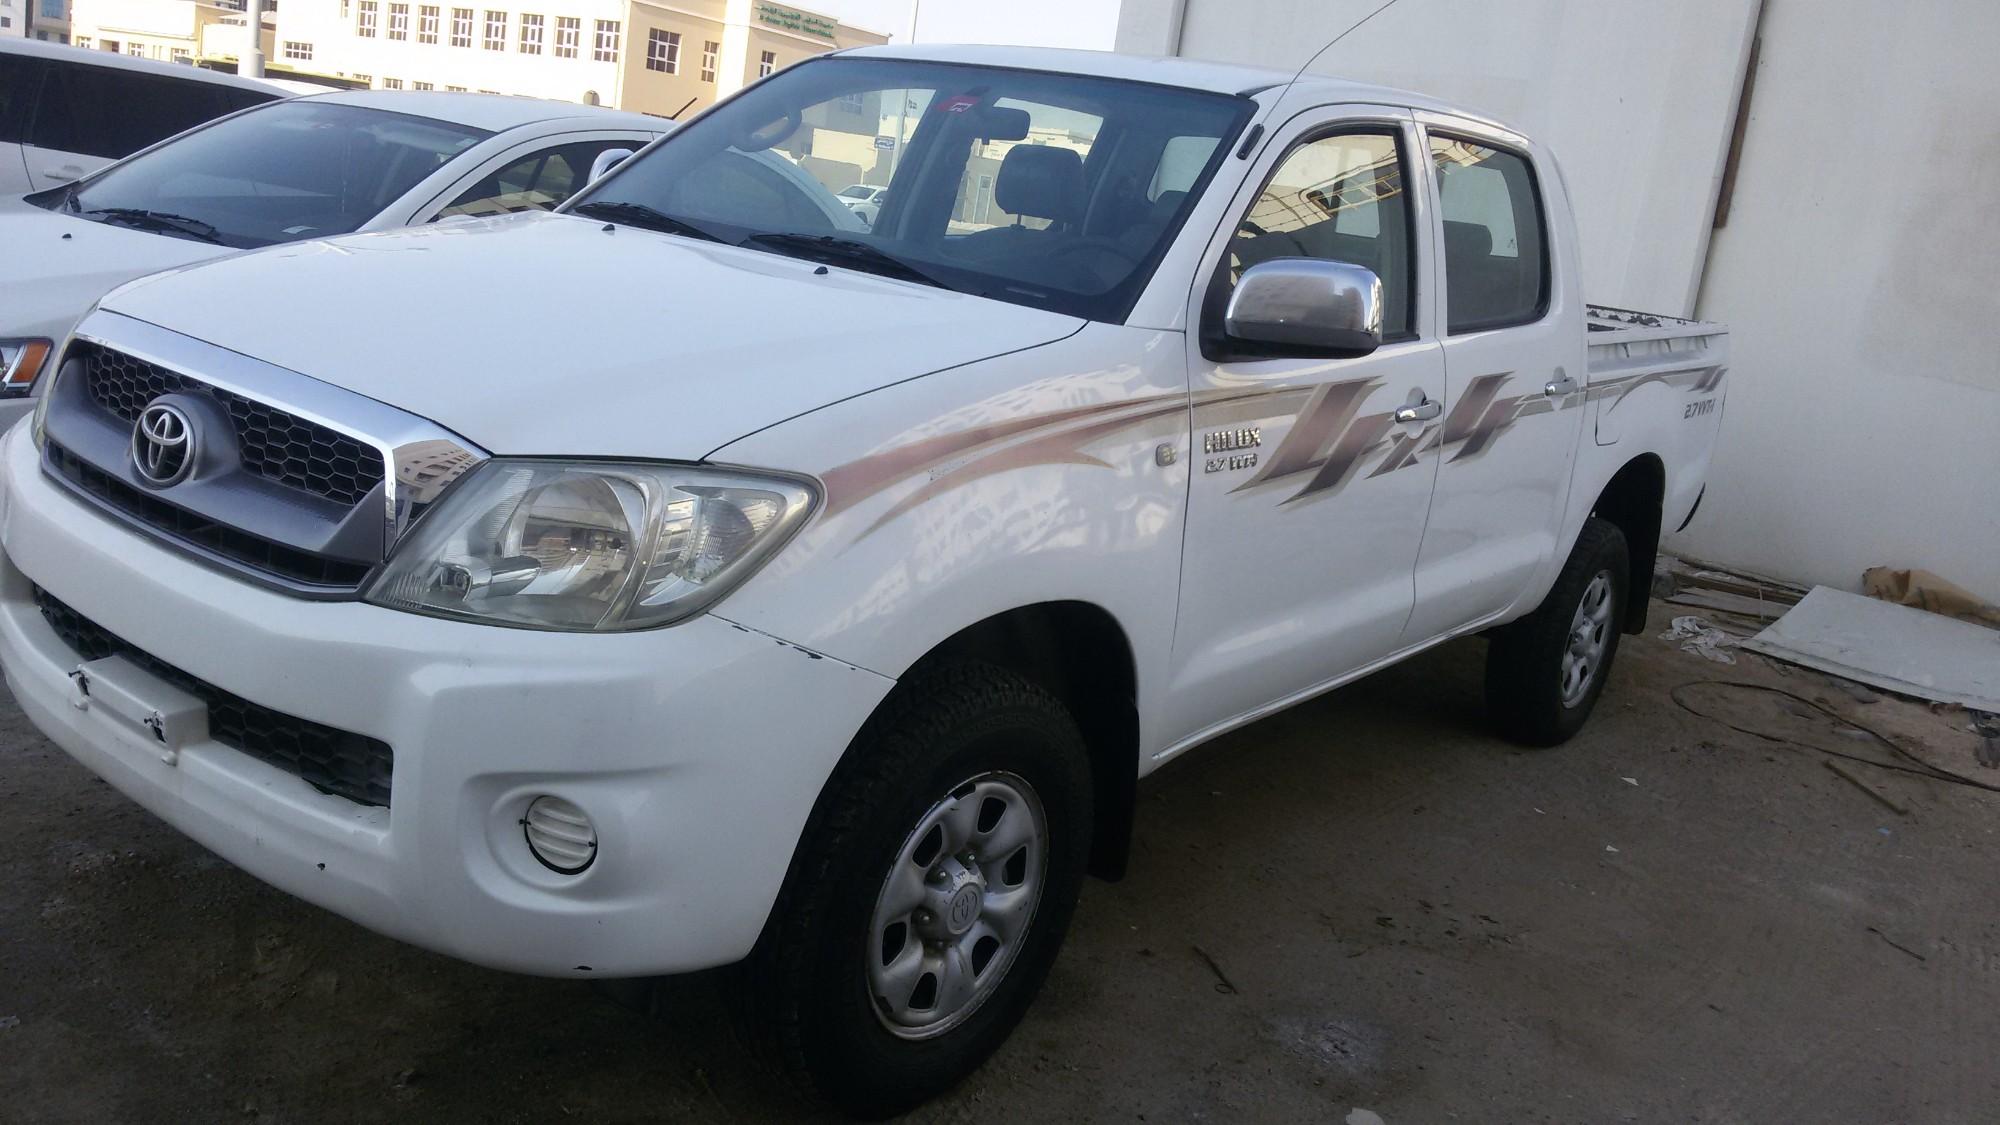 Kelebihan Toyota Hilux 2009 Perbandingan Harga